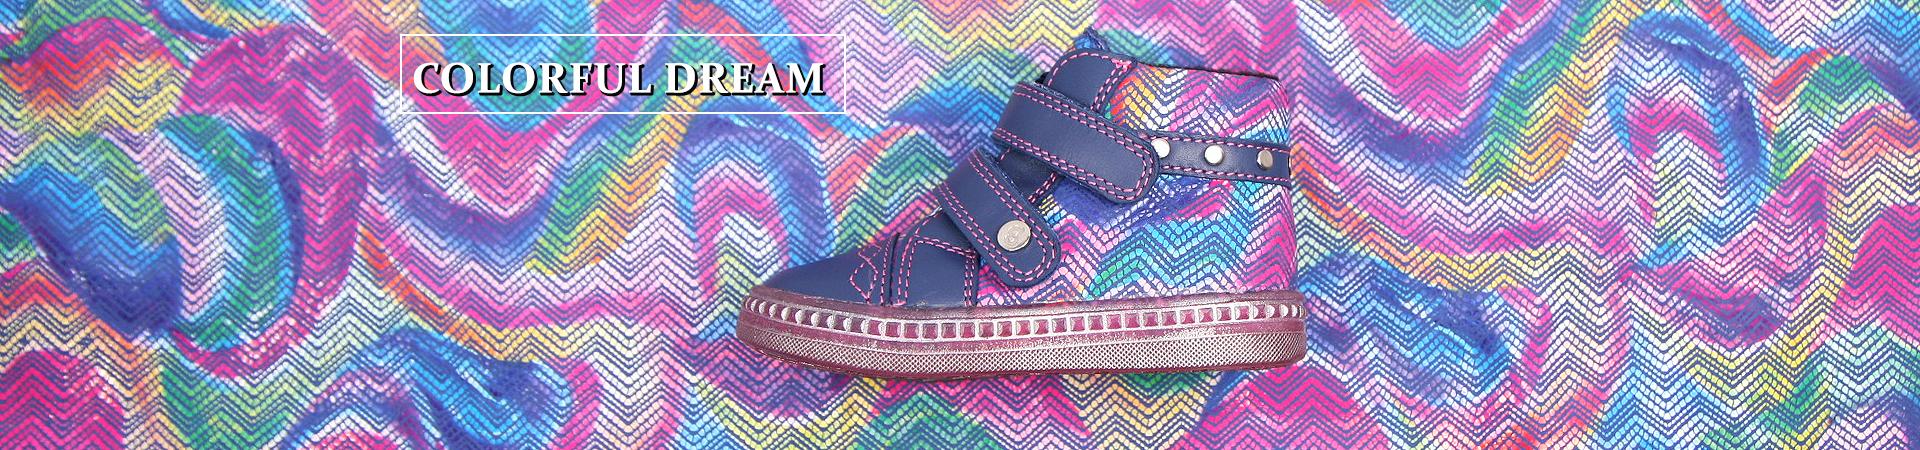 17 Colorful dream pl